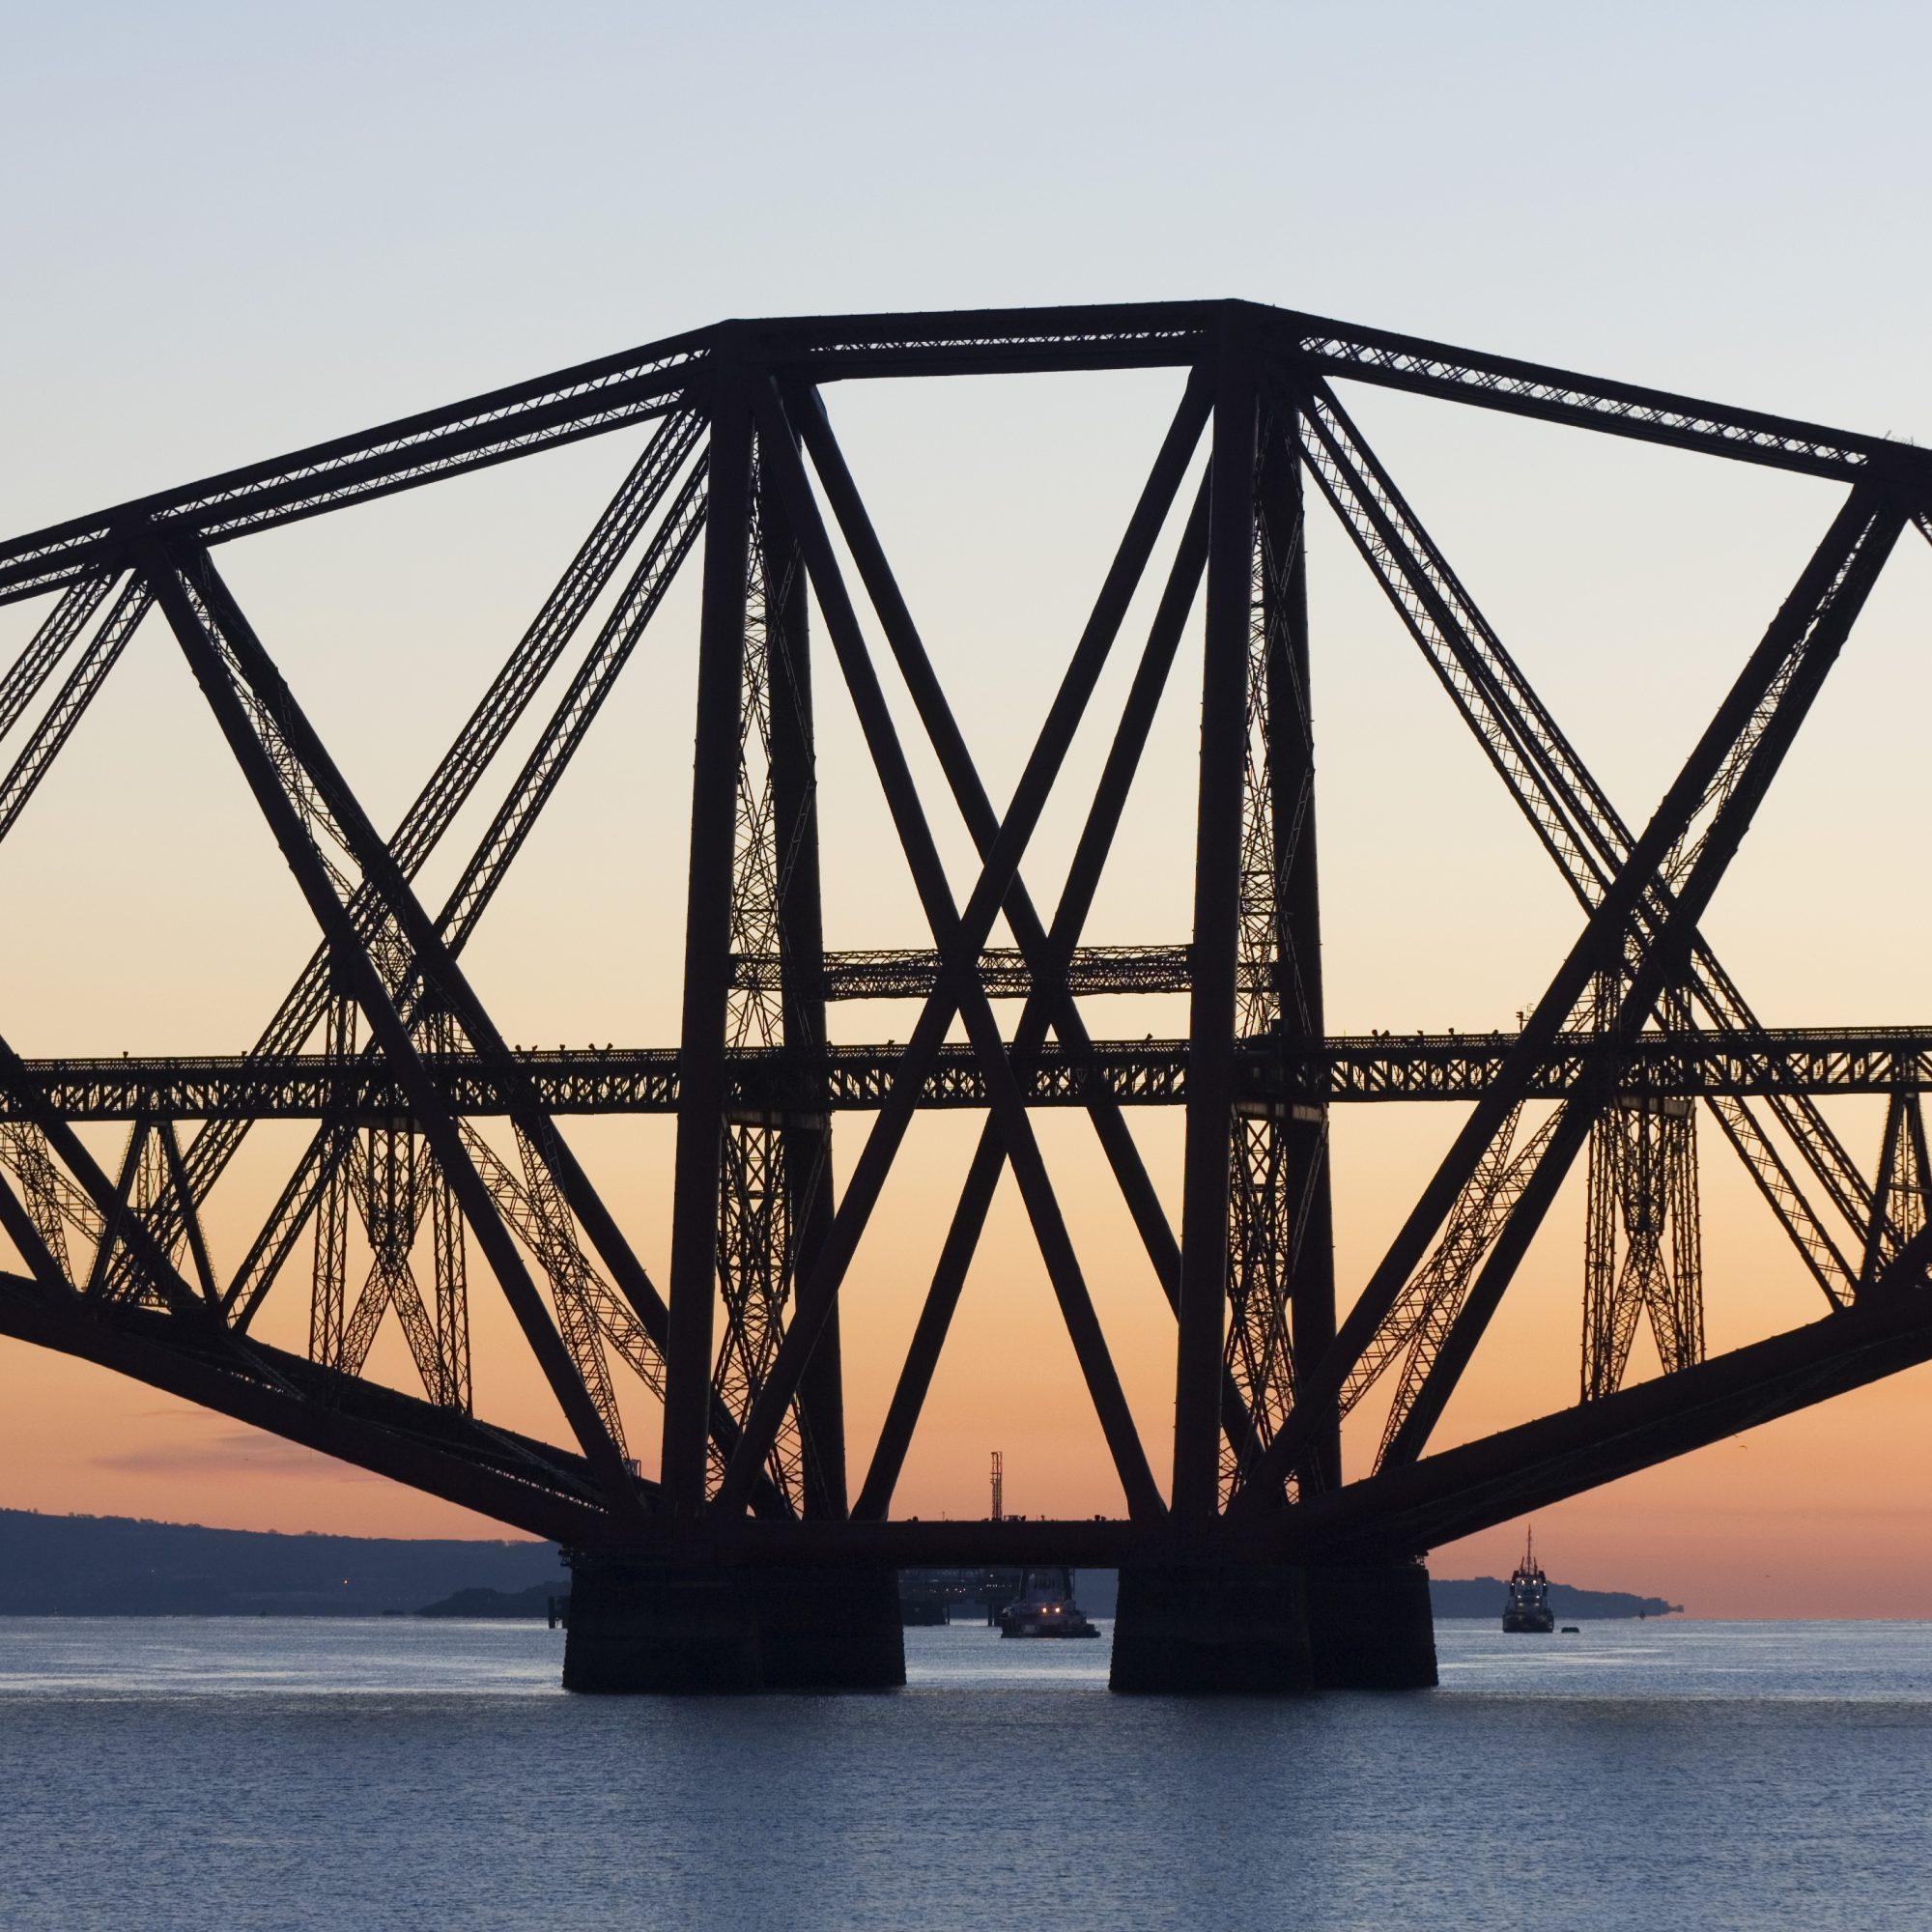 The Forth Rail Bridge at dawn